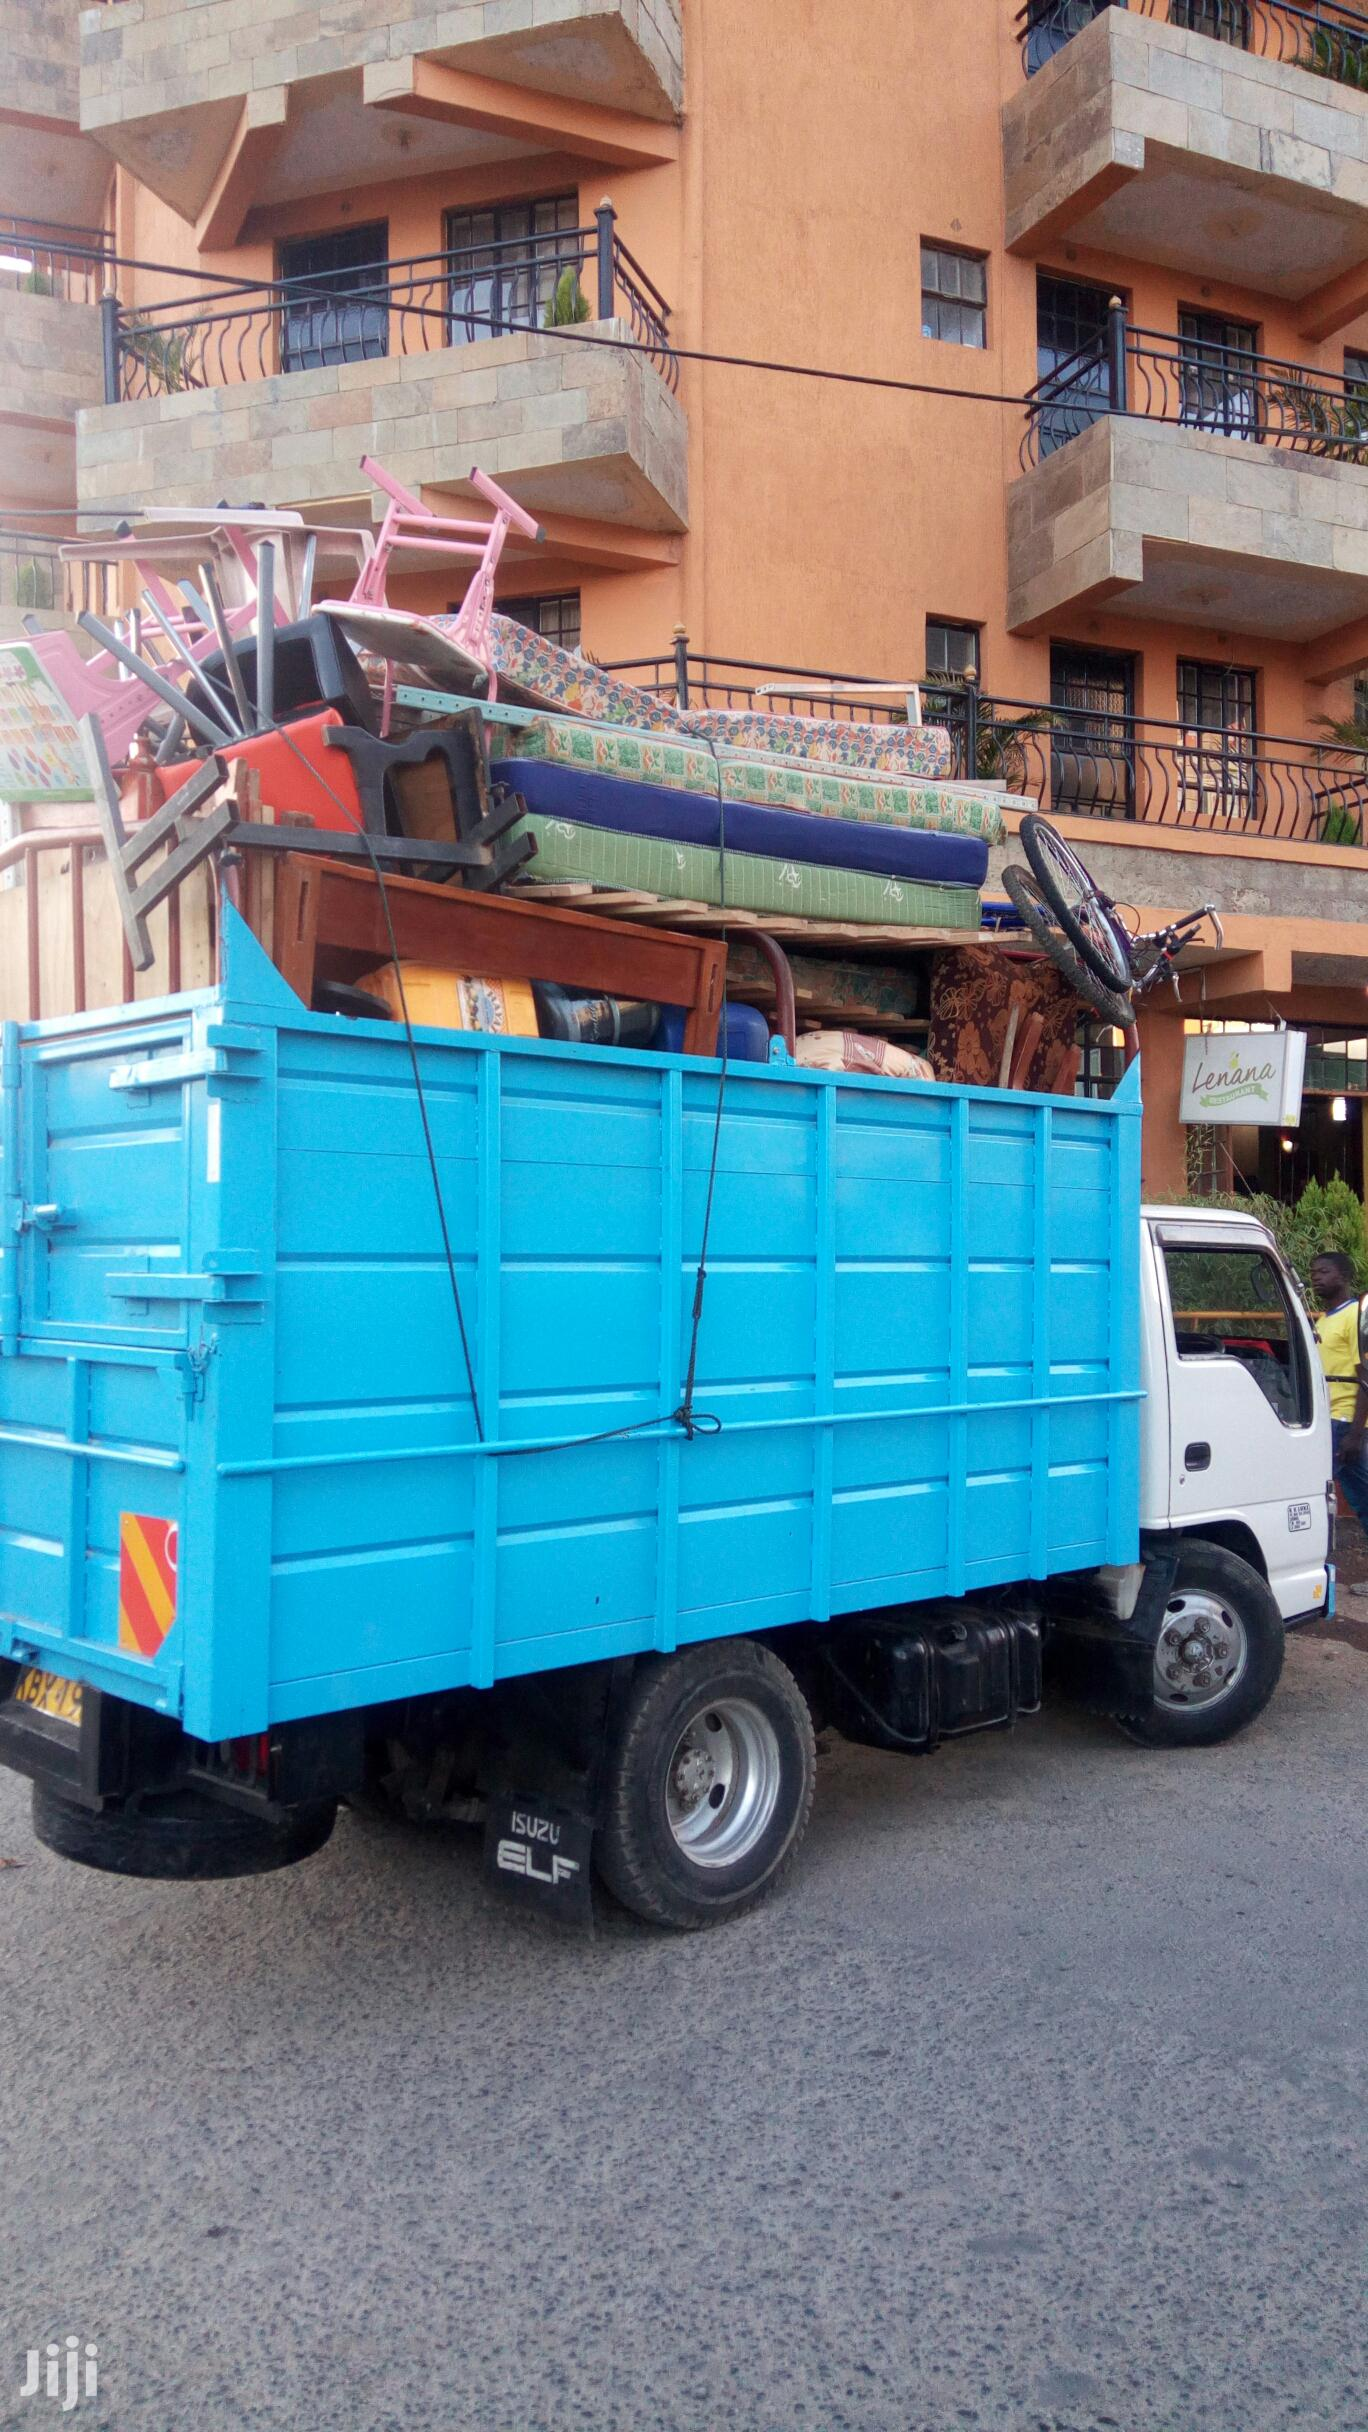 Transport Services   Automotive Services for sale in Embakasi, Nairobi, Kenya